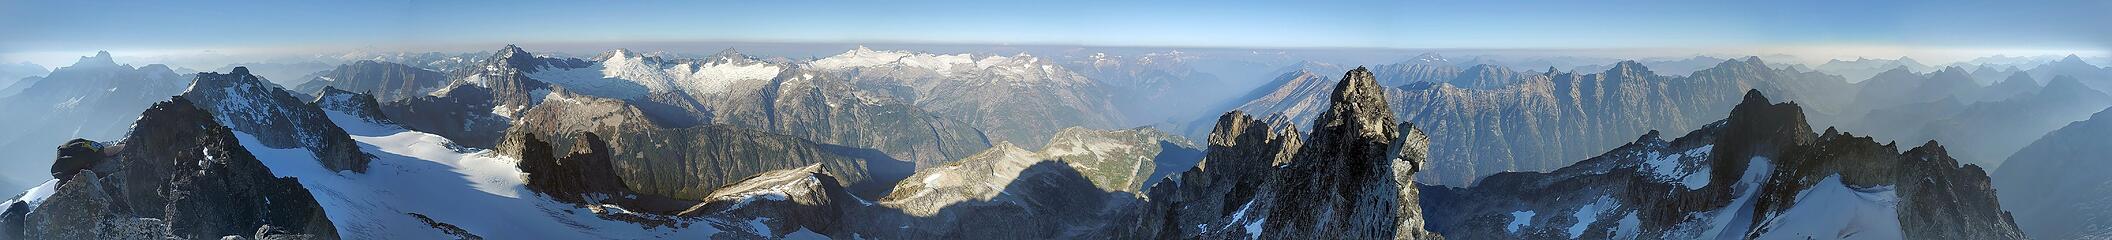 Summit Panorama, stitched by Google